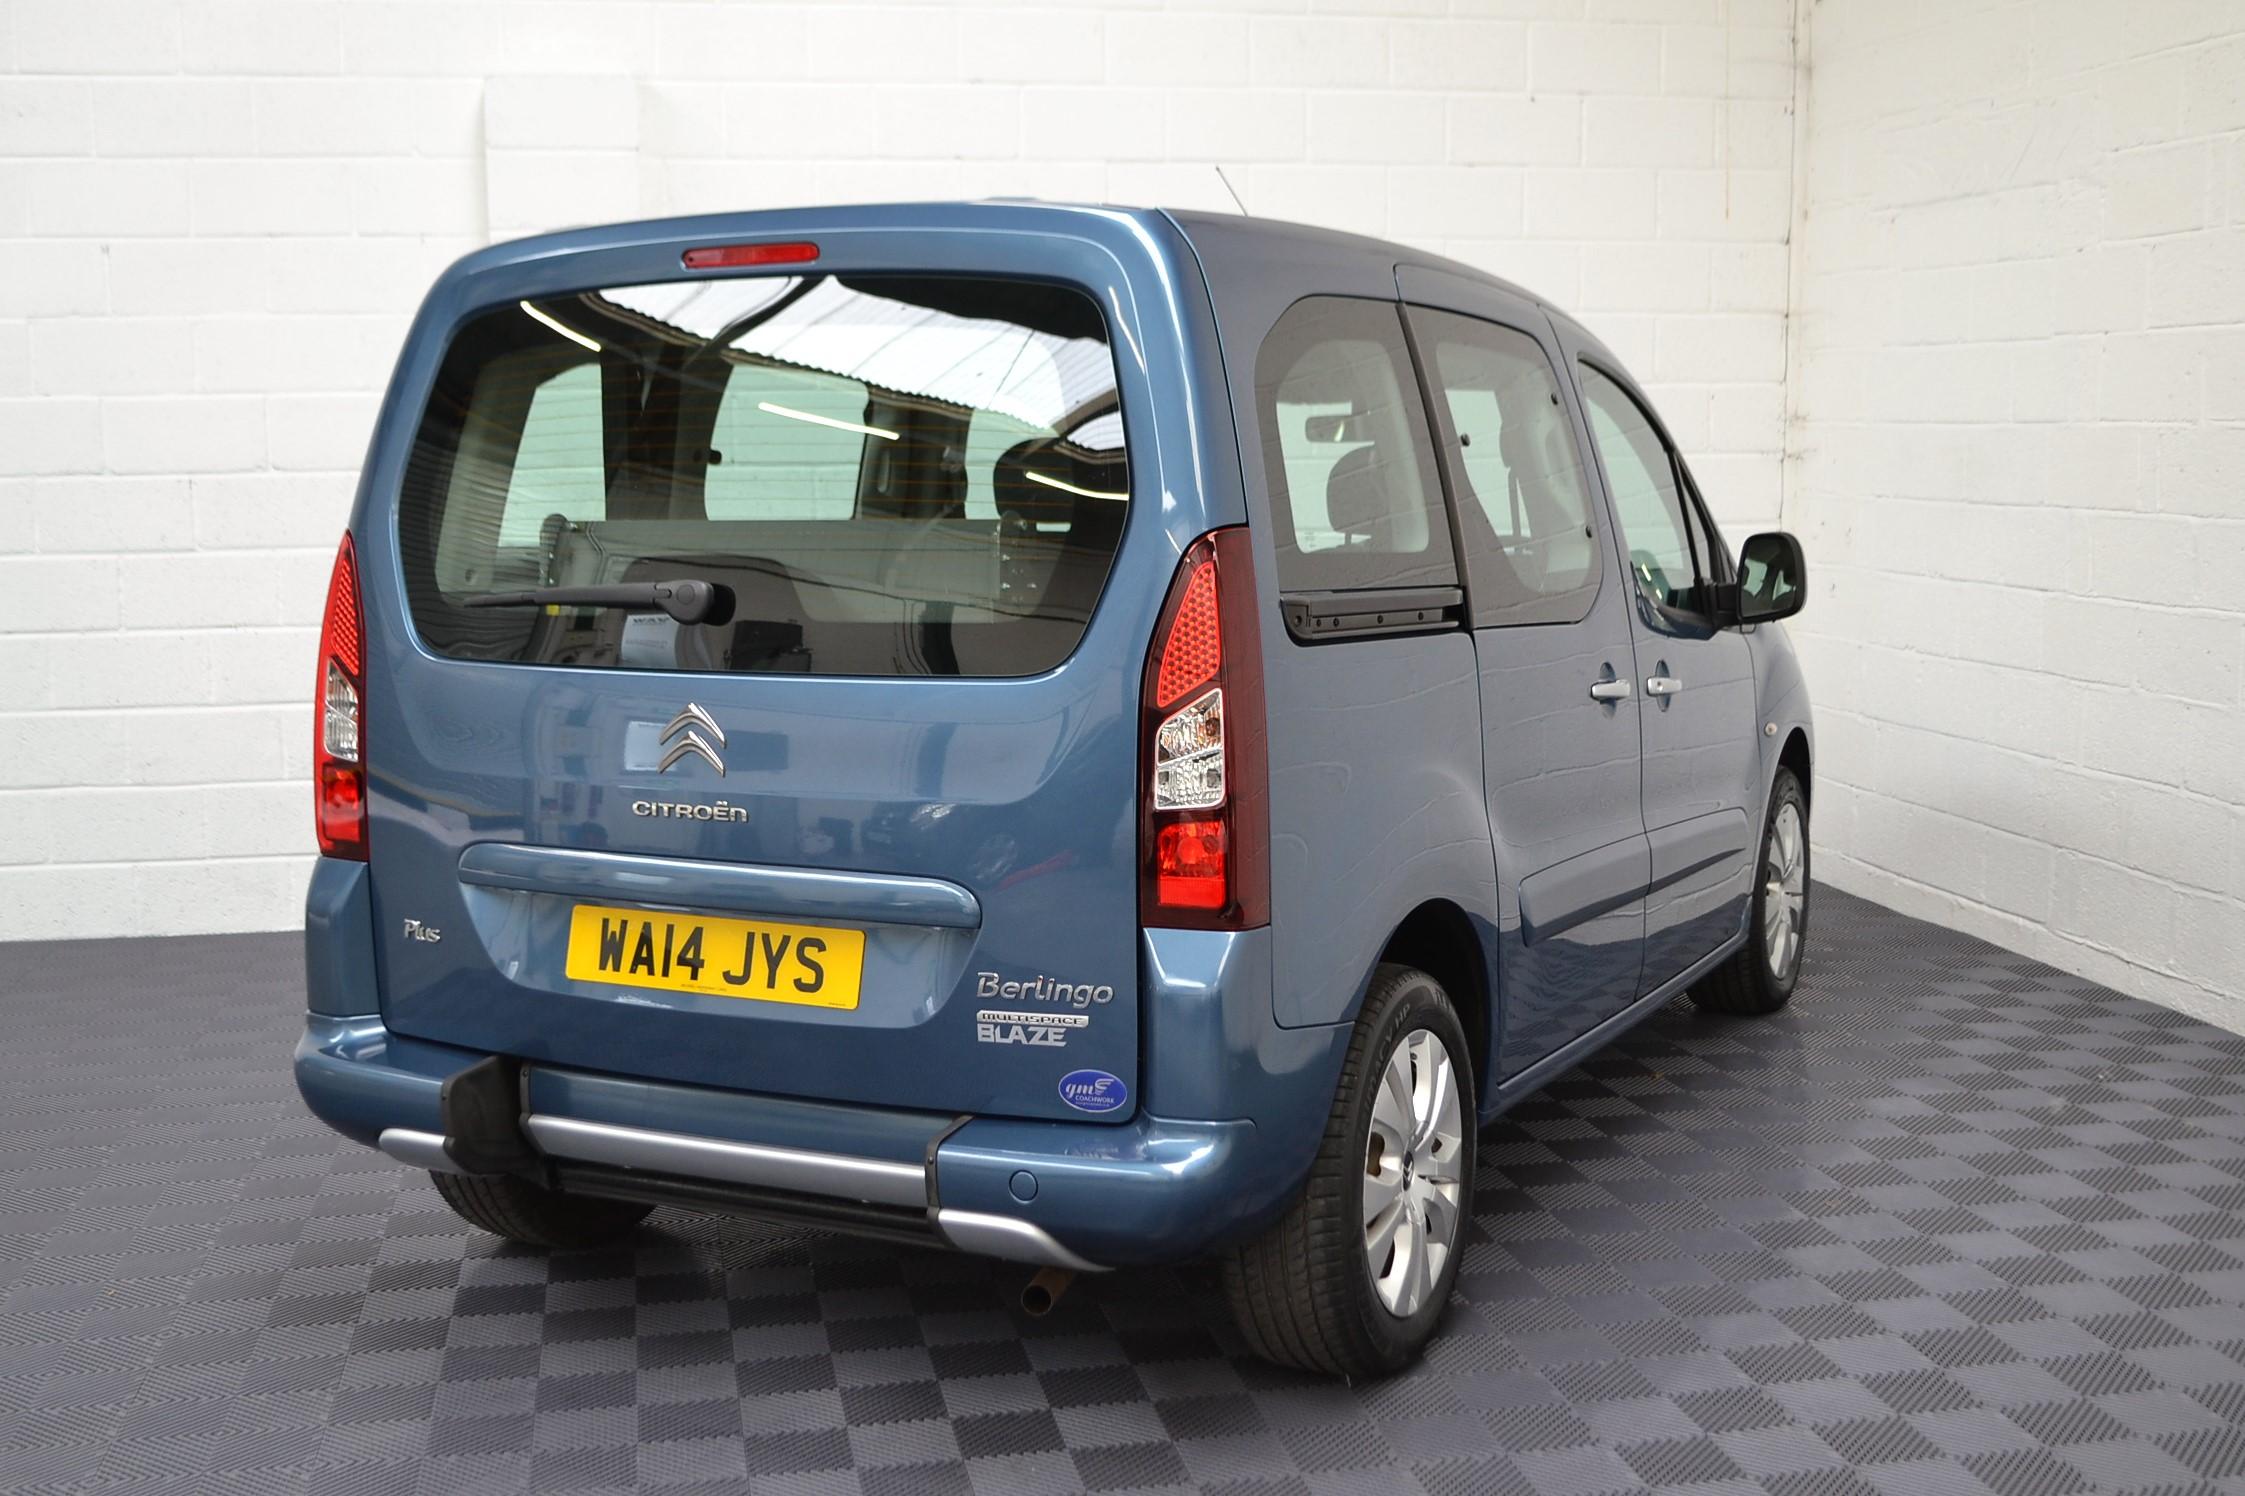 WAV Cars For Sale Bristol Wheelchair Accessible Vehicles Used For Sale Somerset Devon Dorset Bath Citroen Berlingo WA14 JYS 5